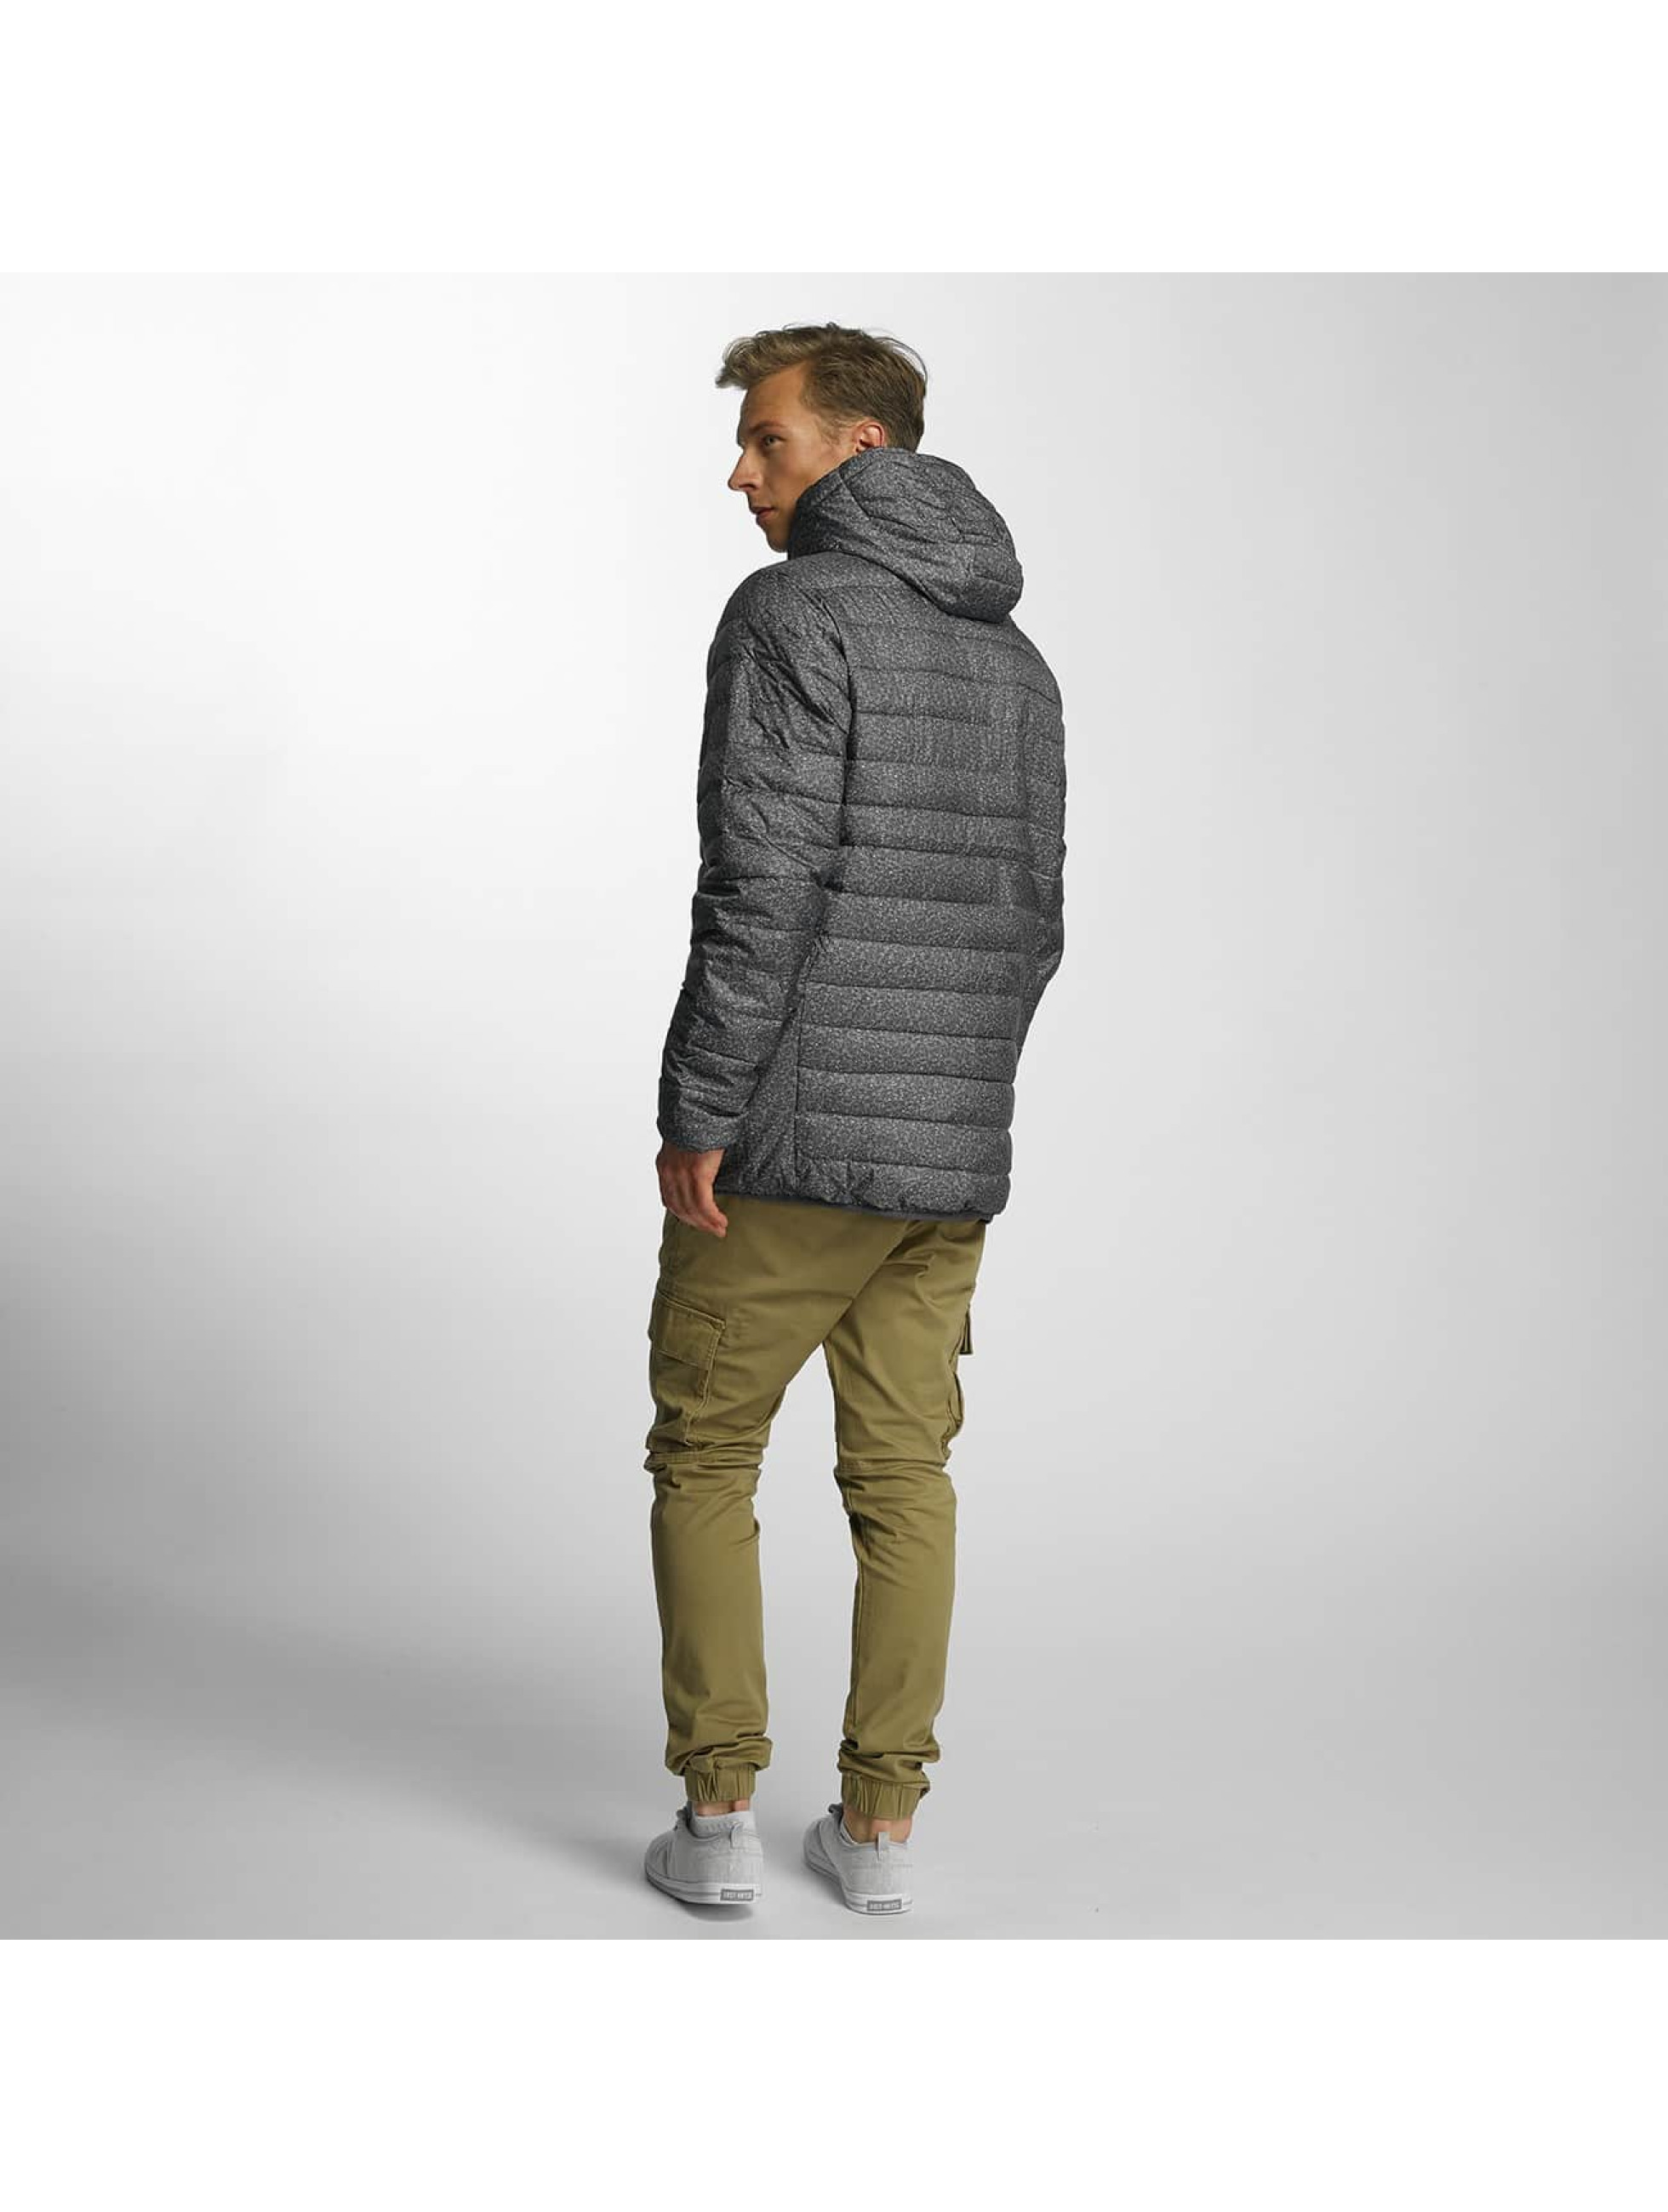 Quiksilver Winter Jacket Everyday Scaly grey